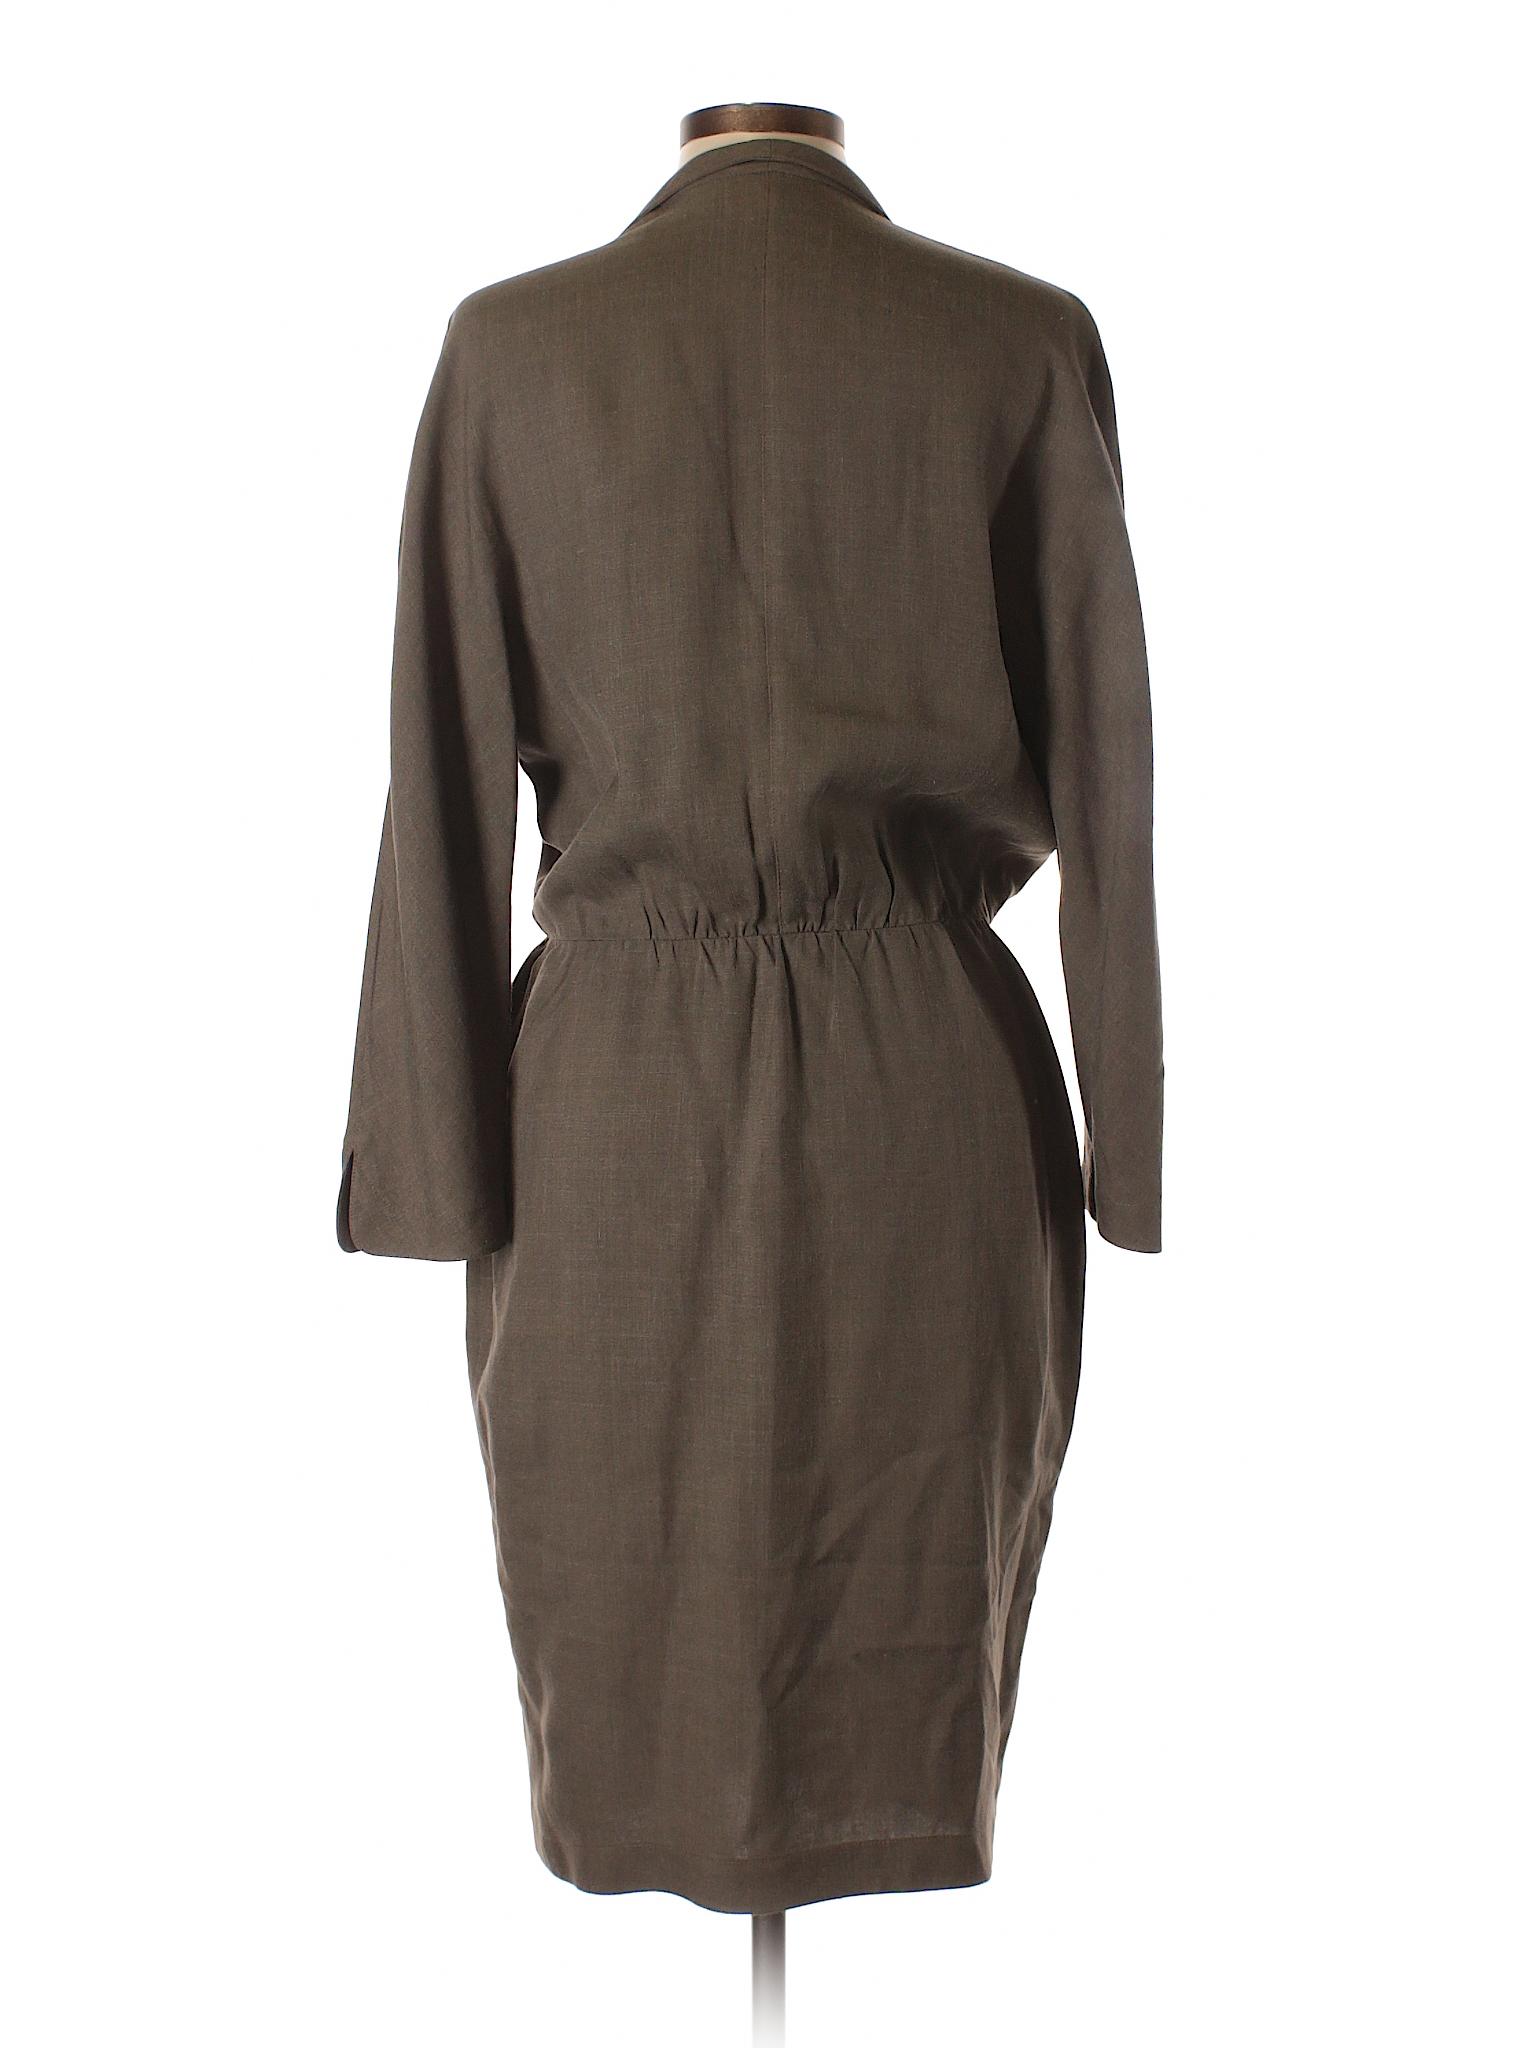 Thierry Thierry Casual Selling Selling Selling Mugler Dress Dress Mugler Casual APqEOc